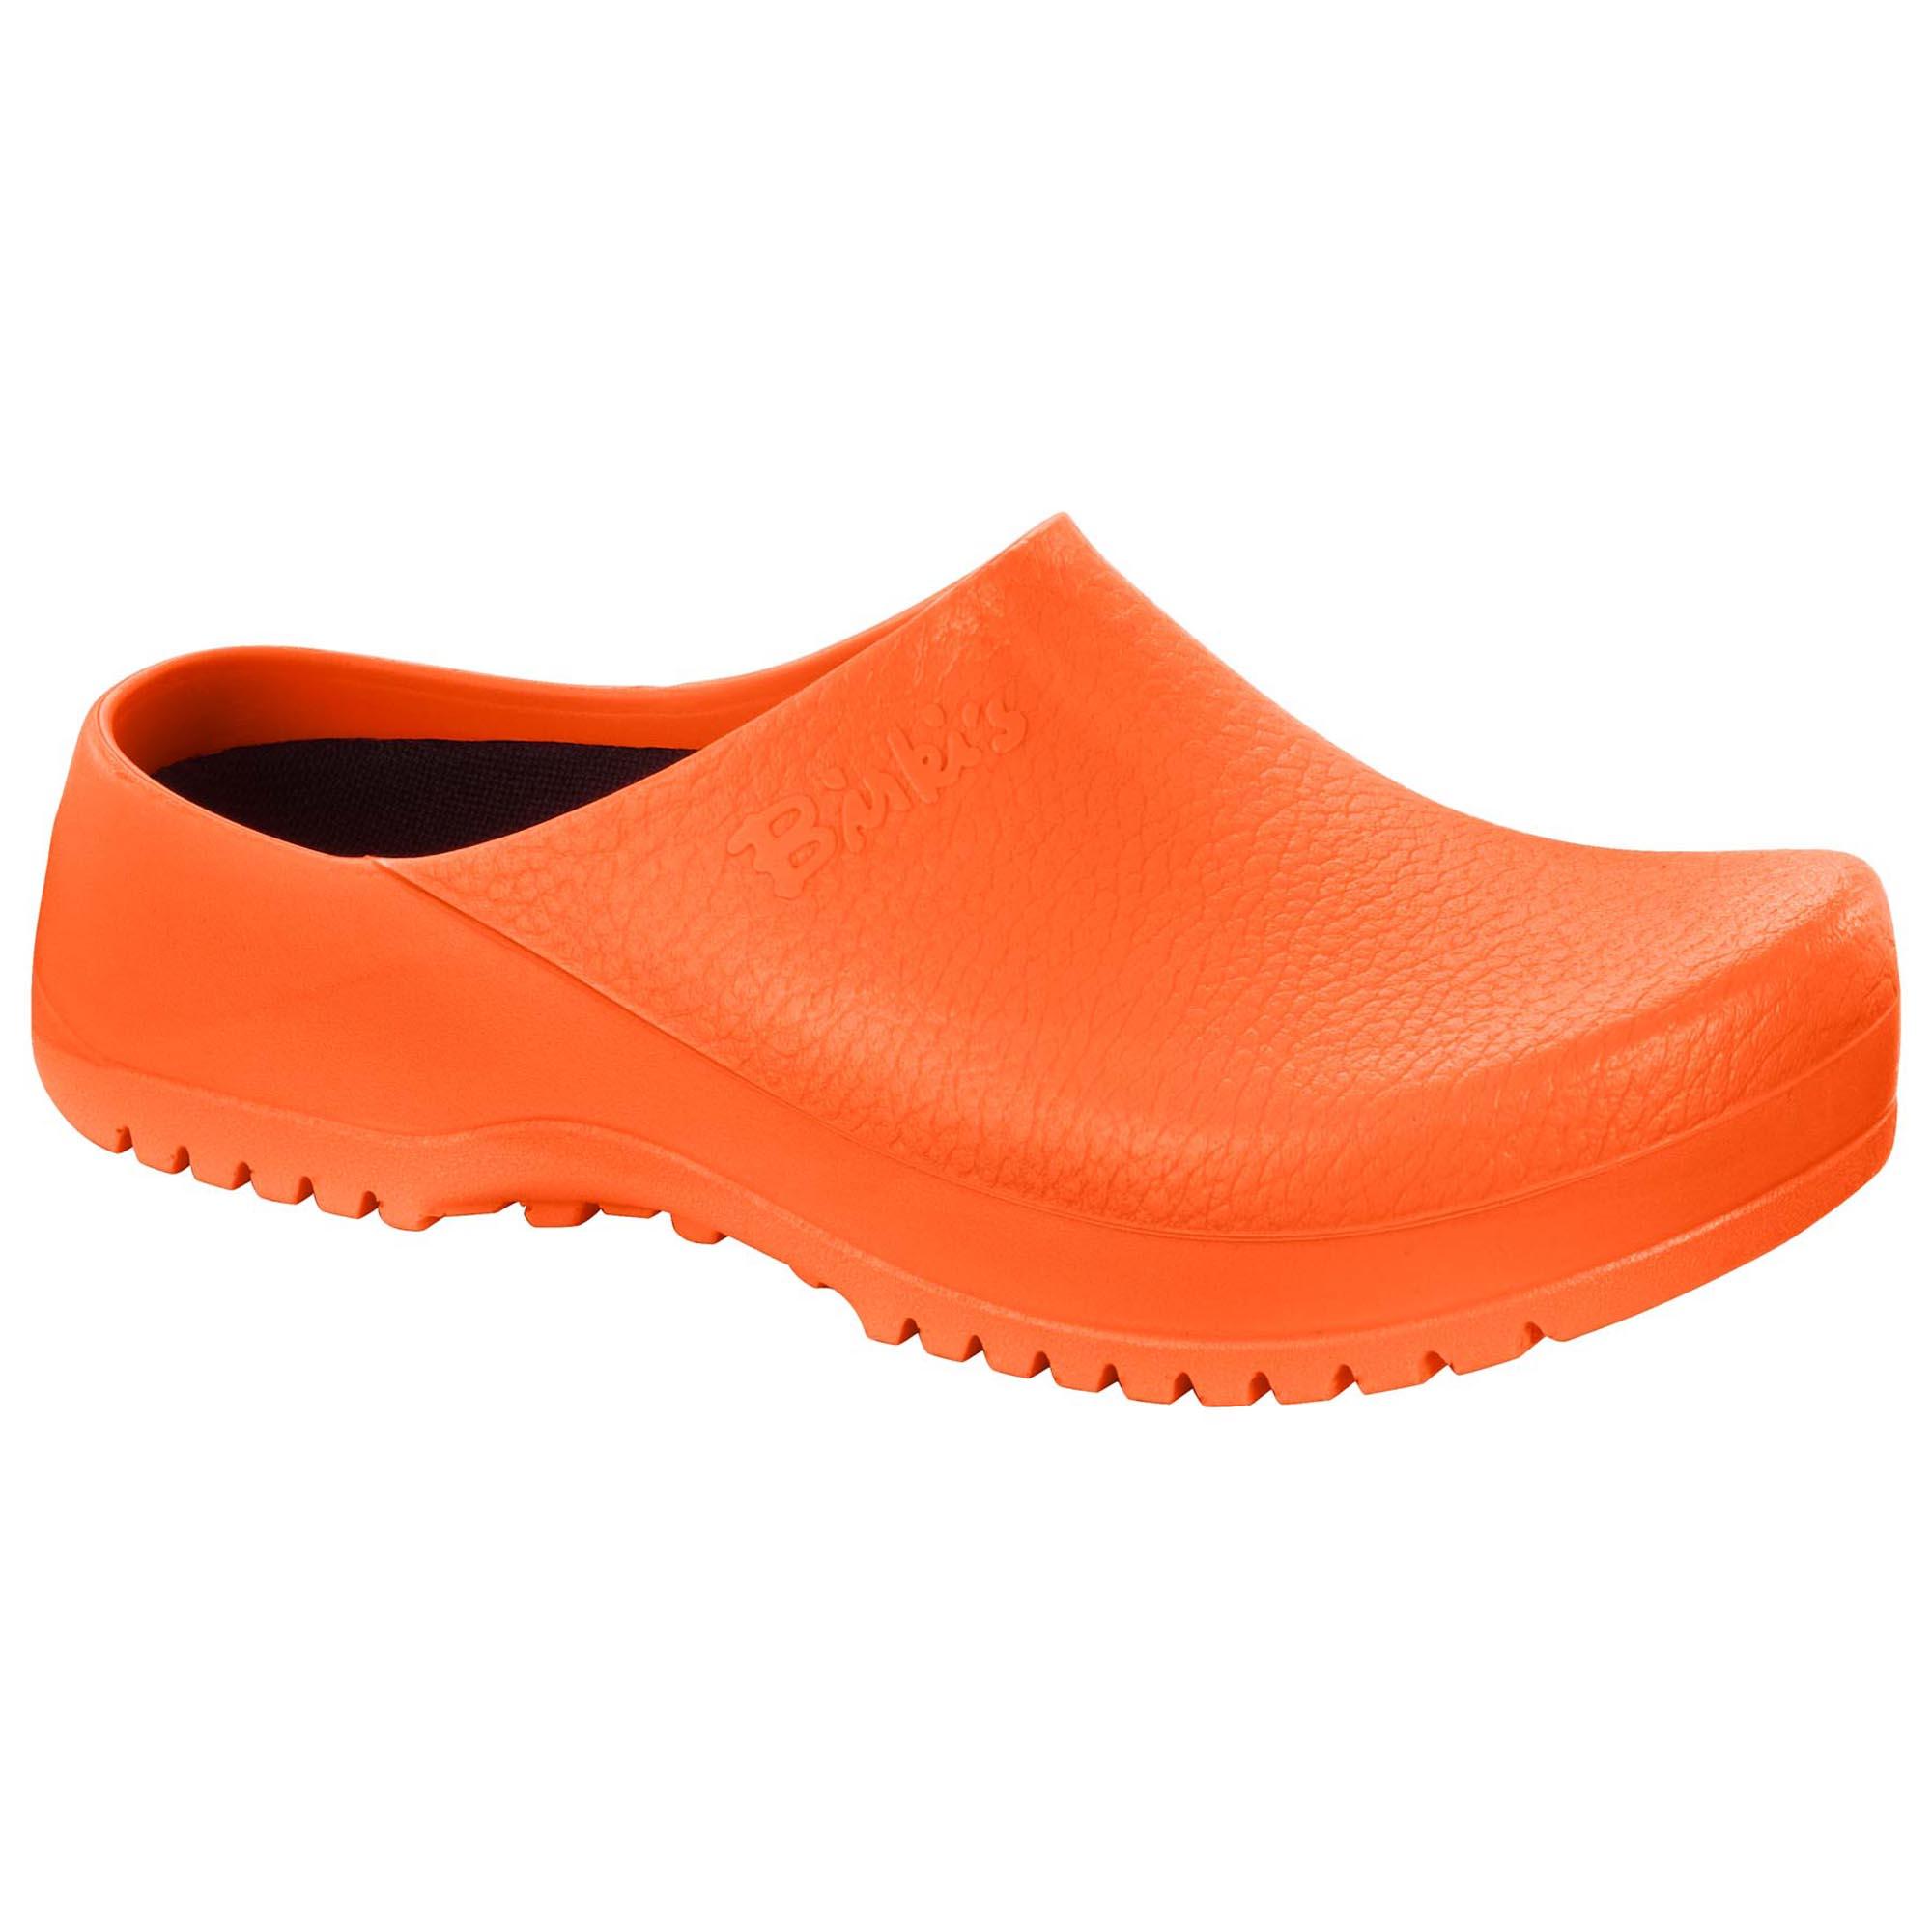 d66413160e7c Polyurethane Neon Orange